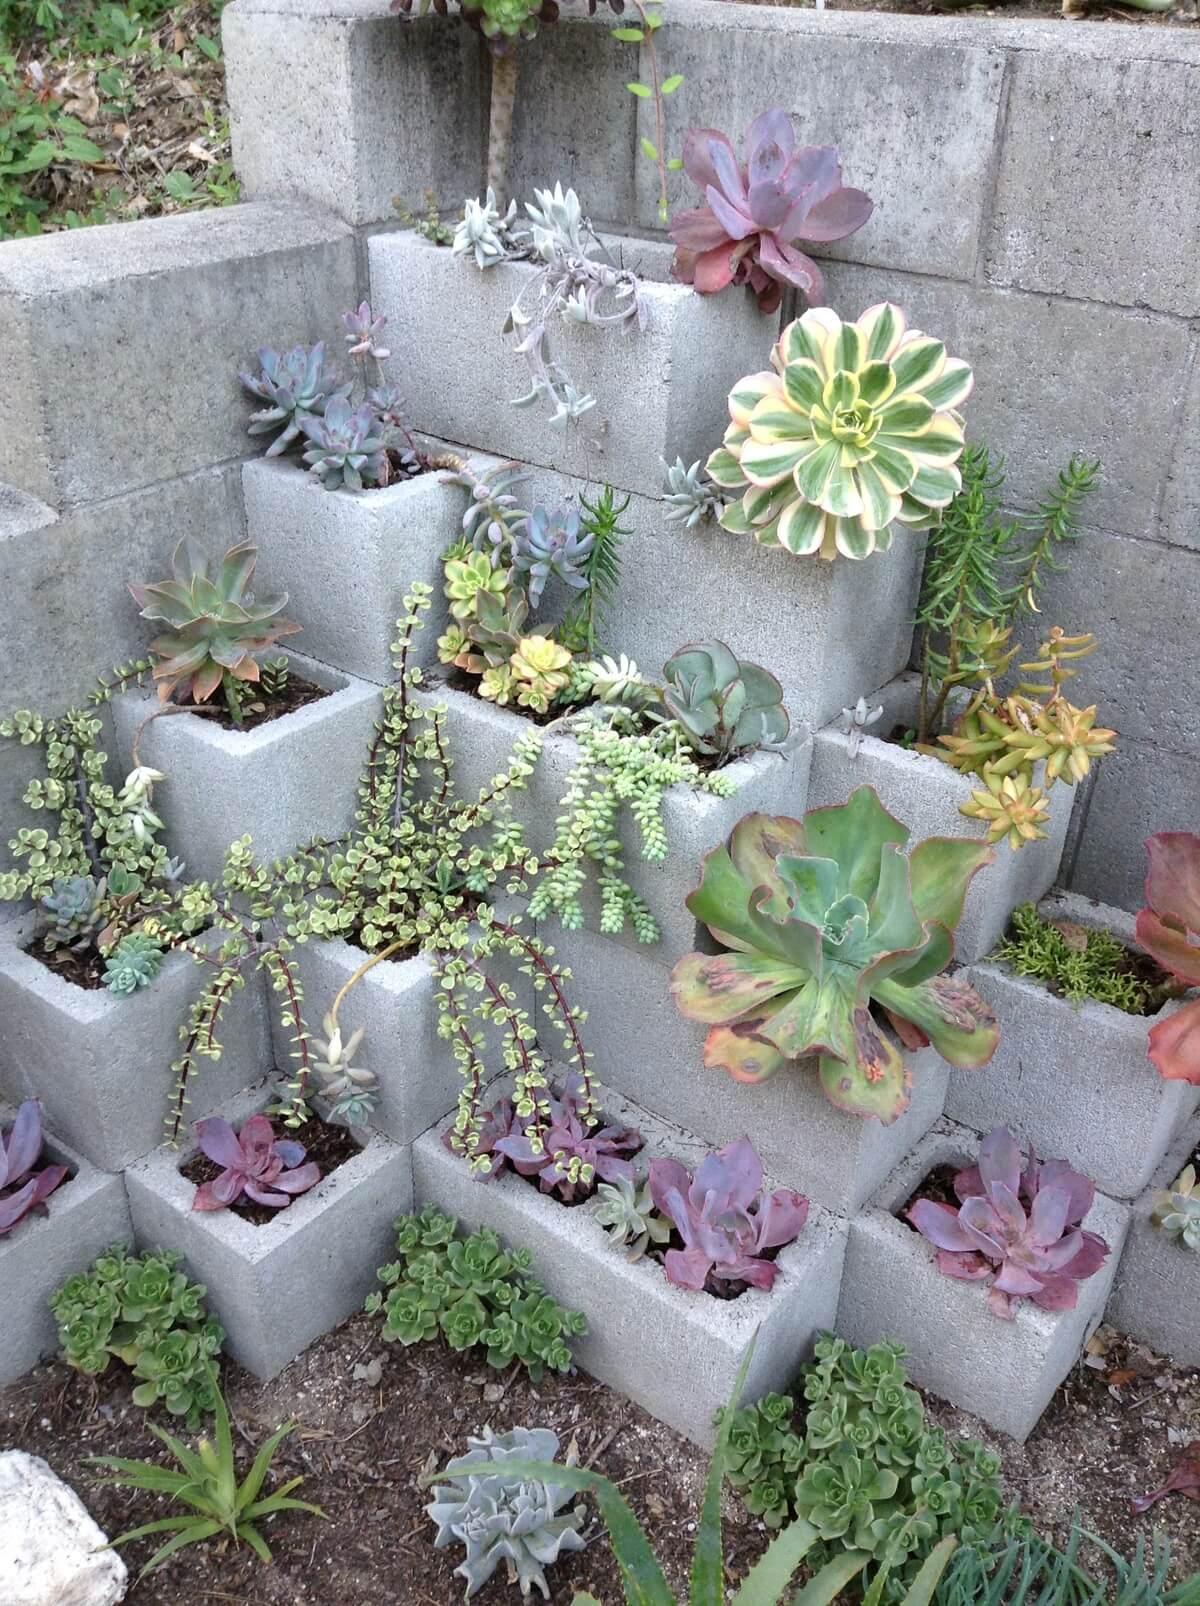 Concrete Block Corner Garden Planter